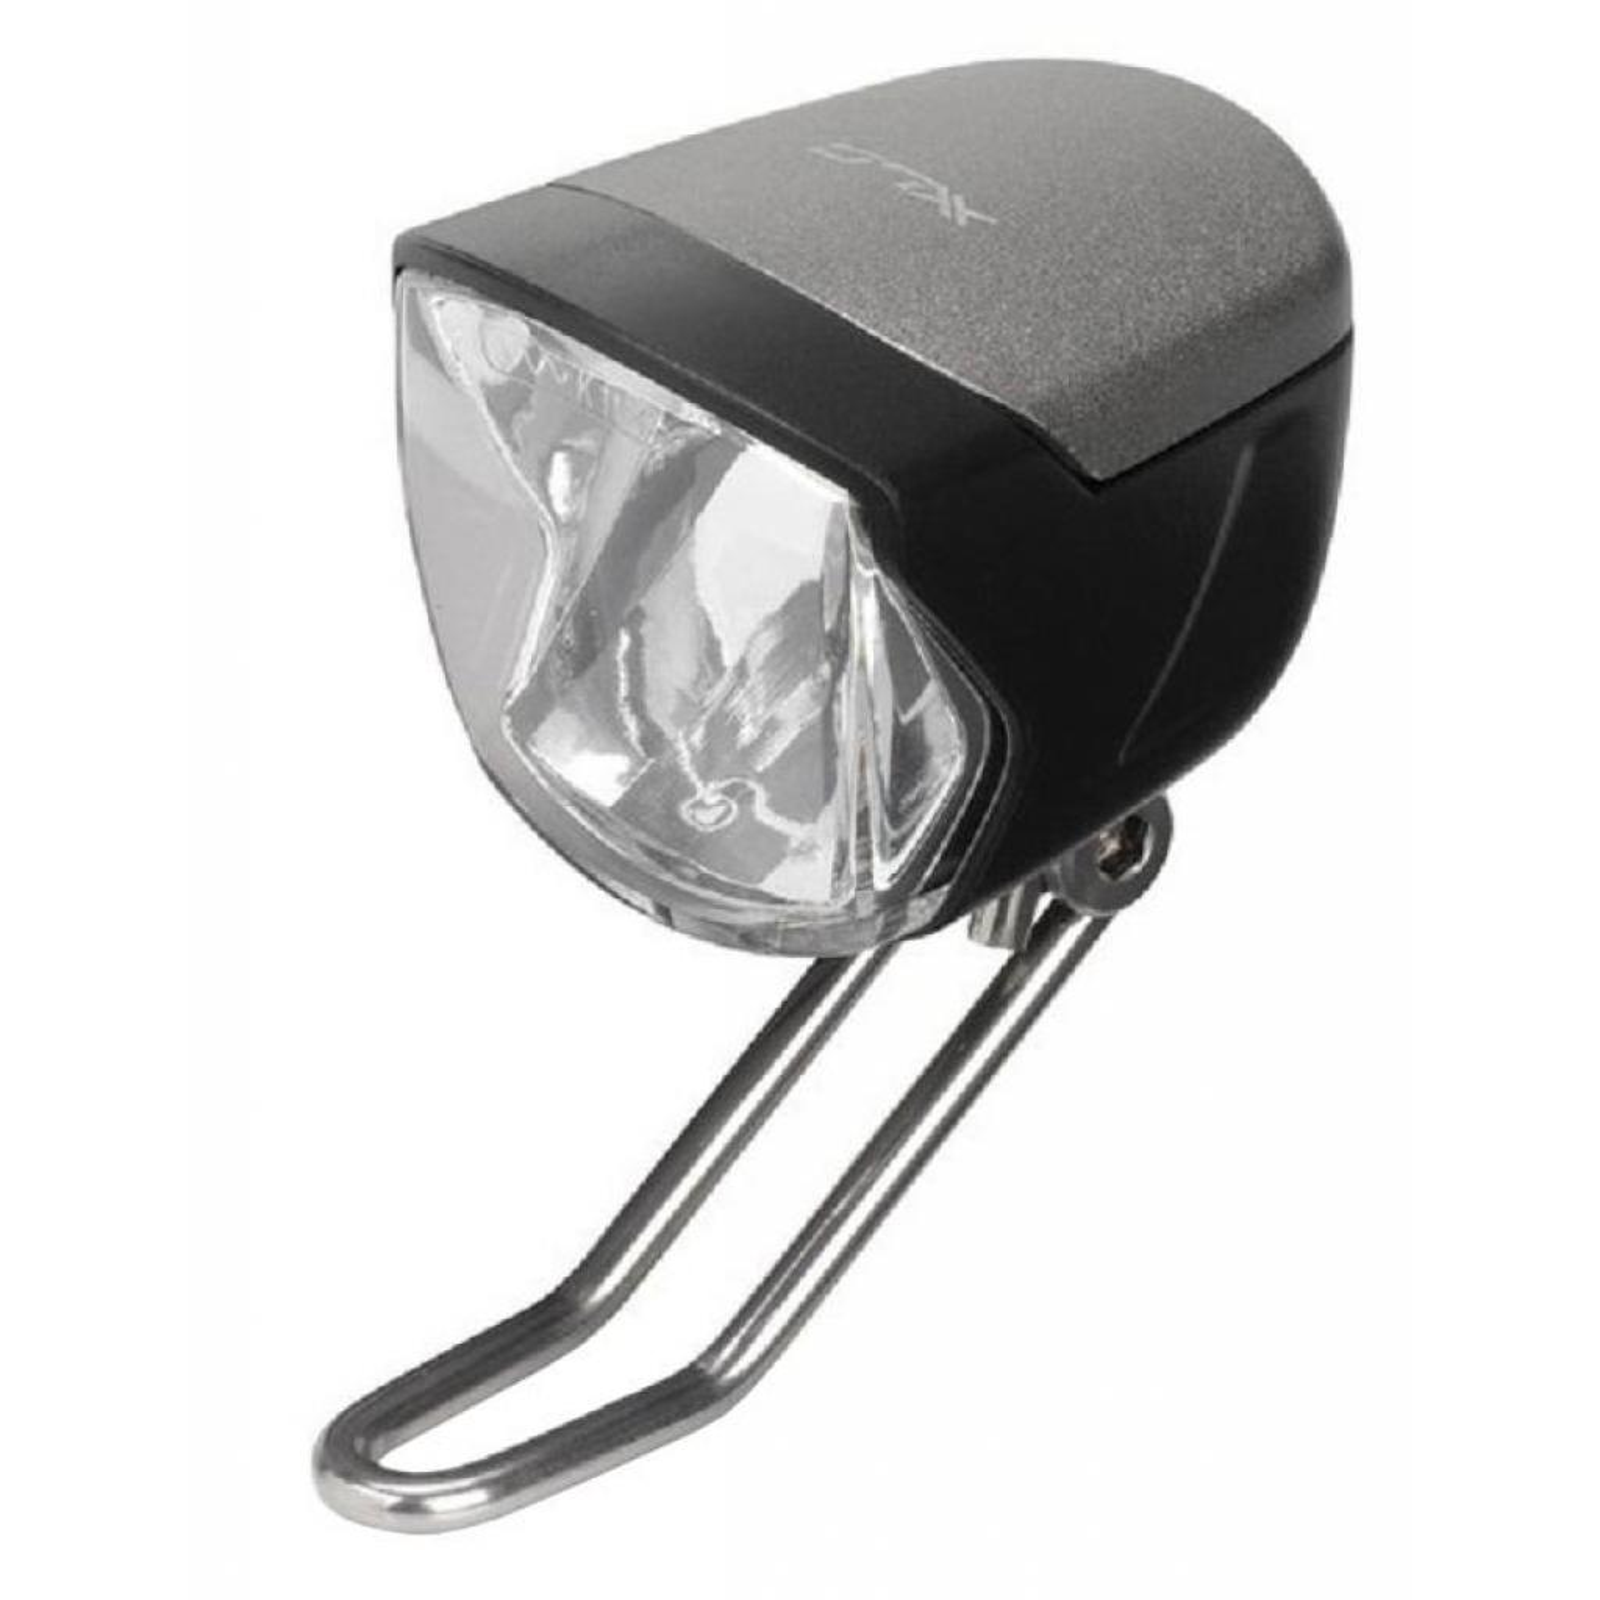 Передняя велофара XLC LED 70Lux E-Bike 6-48V, черный (2500223100)